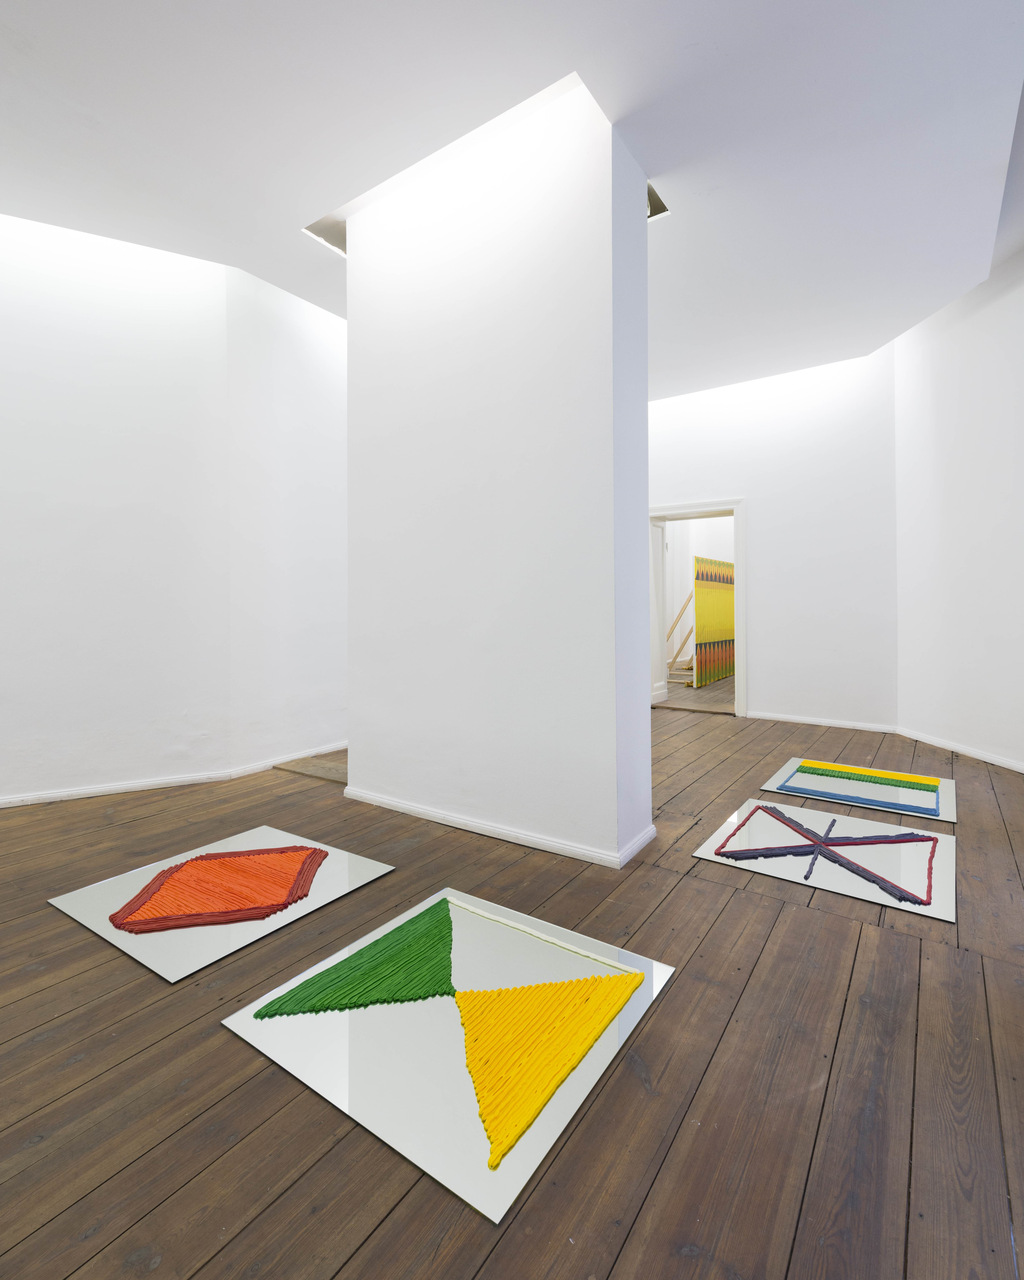 TGood TSJO¦êRBERG artdoc Grimmuseum 27 02 2015 _0086